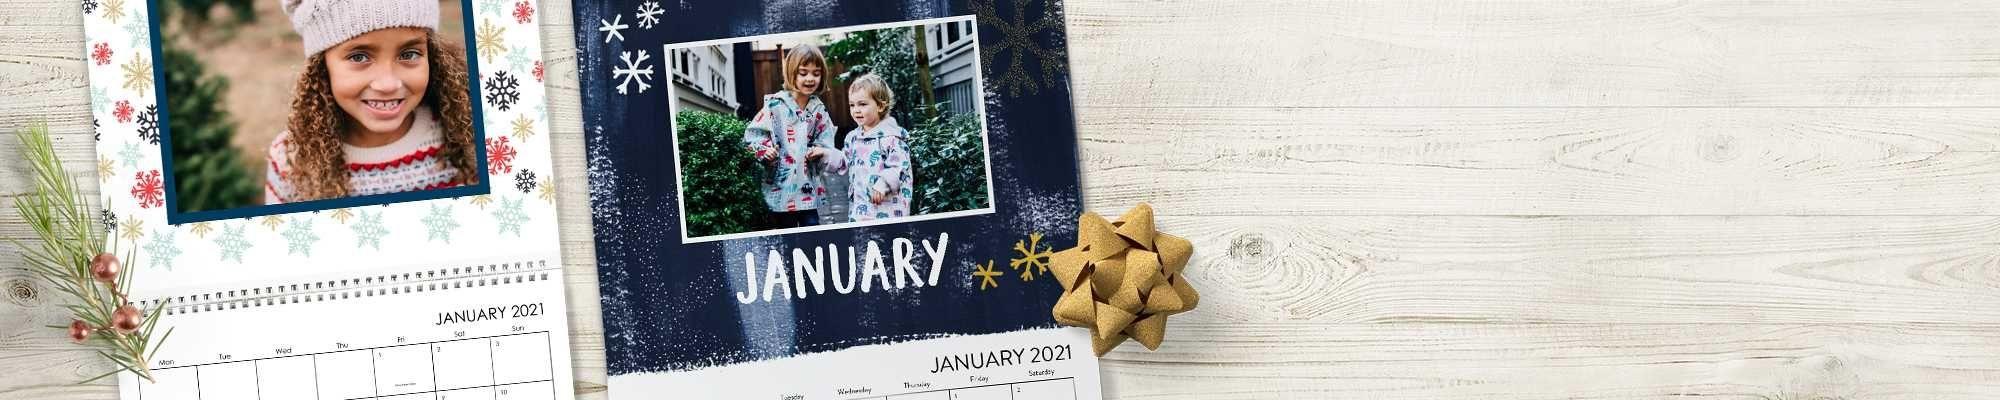 Compare Personalized Photo Wall & Desktop Calendars